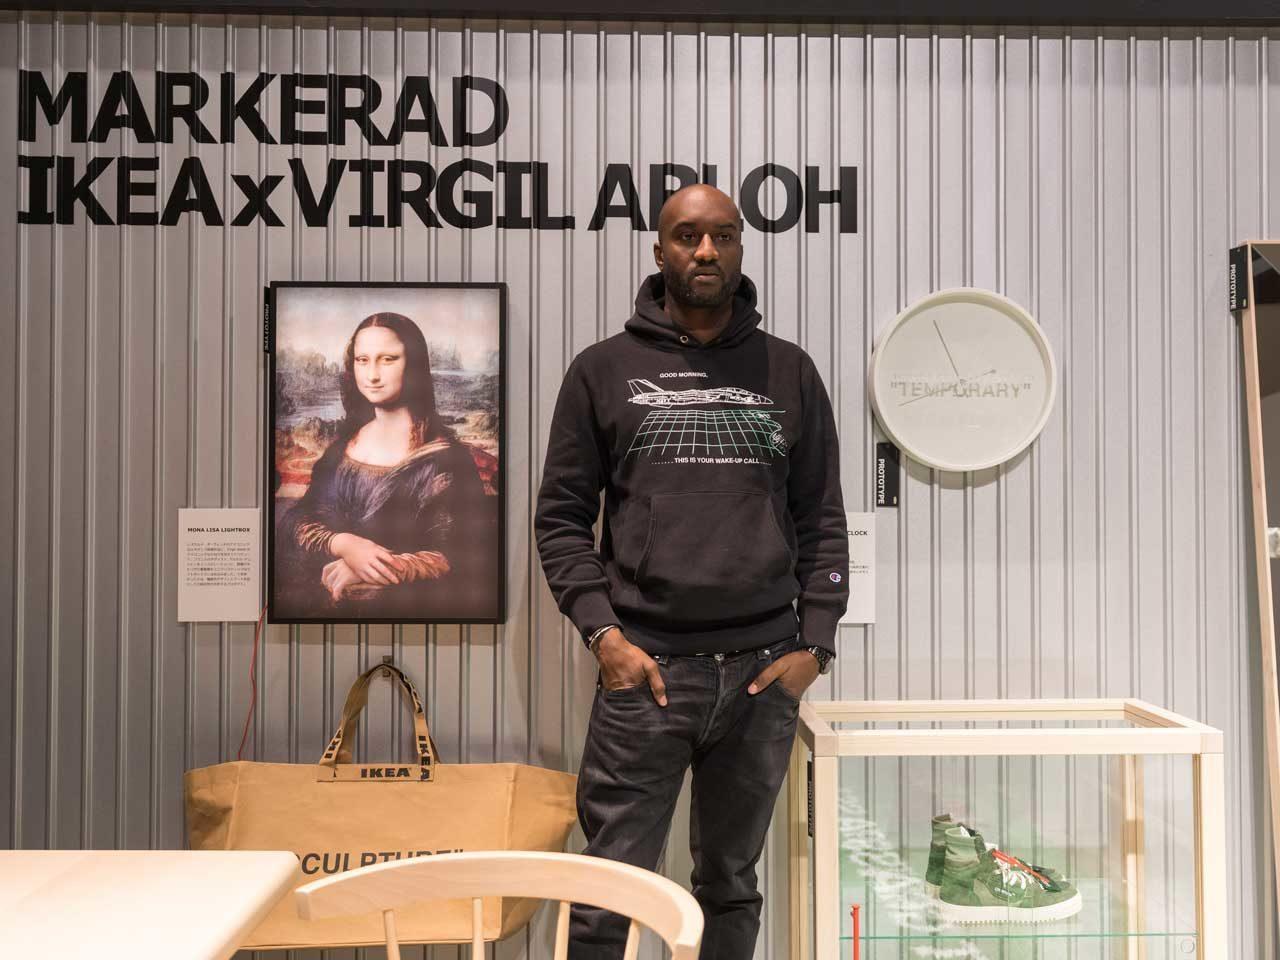 Markerad, Ikea x Virgil Abloh.